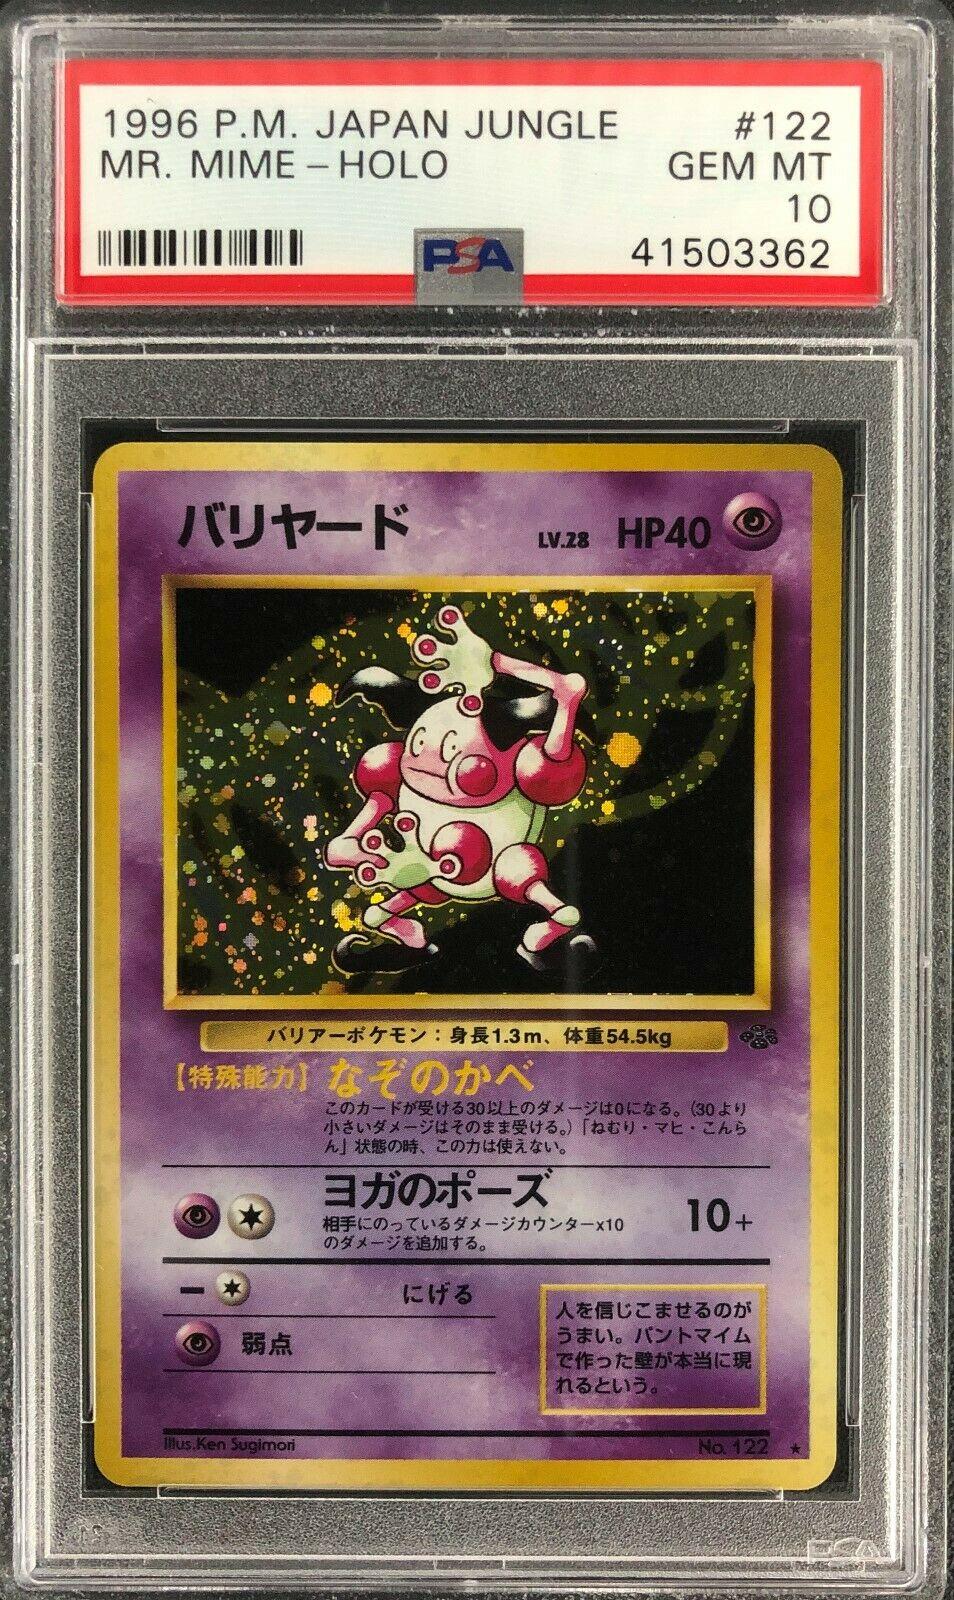 Japanese Mr Mime Jungle Holo Shiny Pokemon Card Mint PSA 10